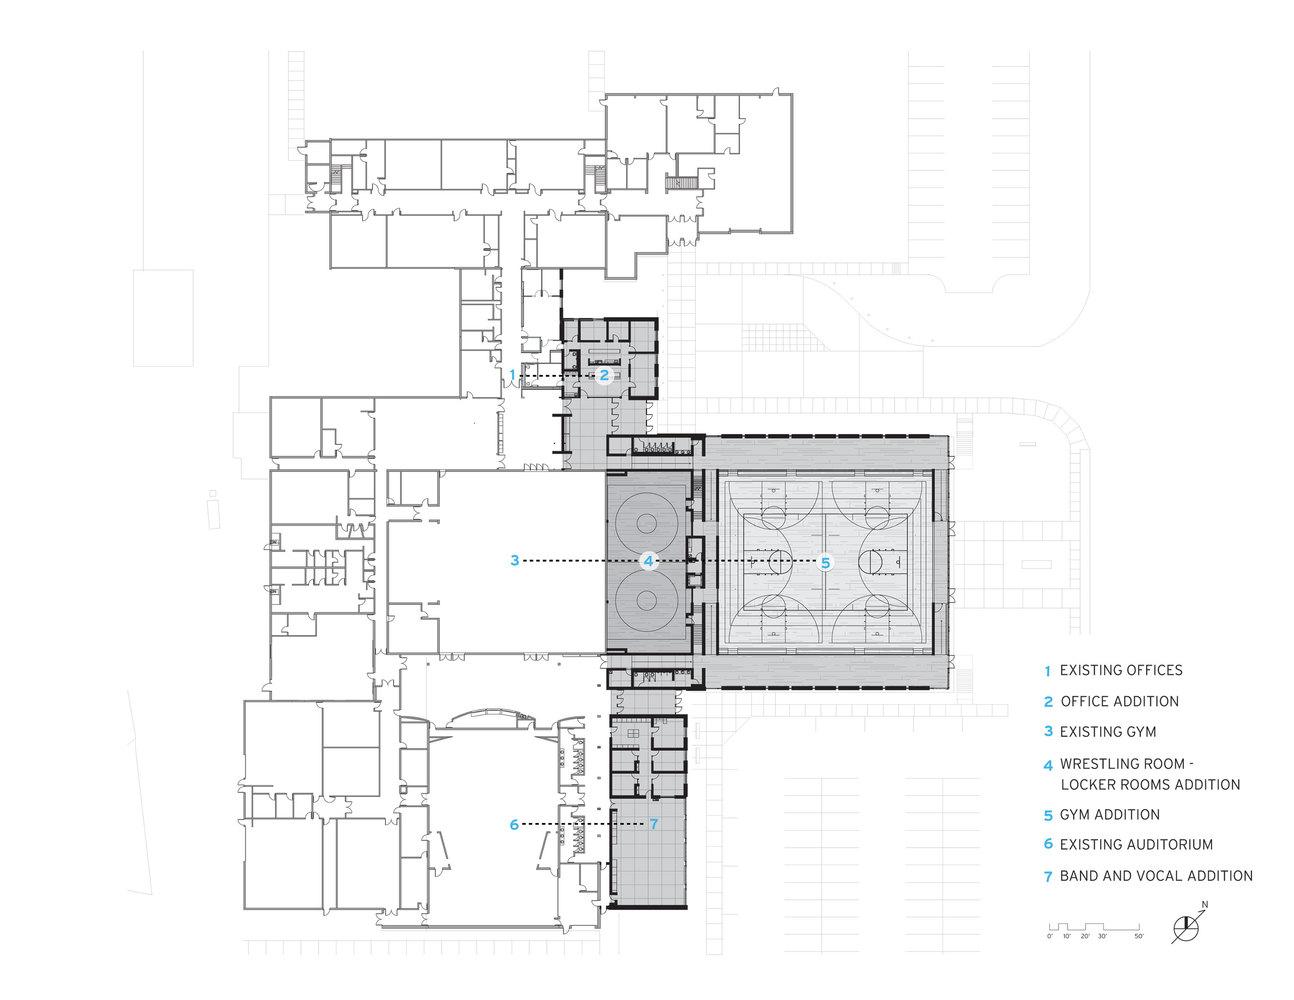 Gallery Of Cascade High School Expansion Neumann Monson Architects 12